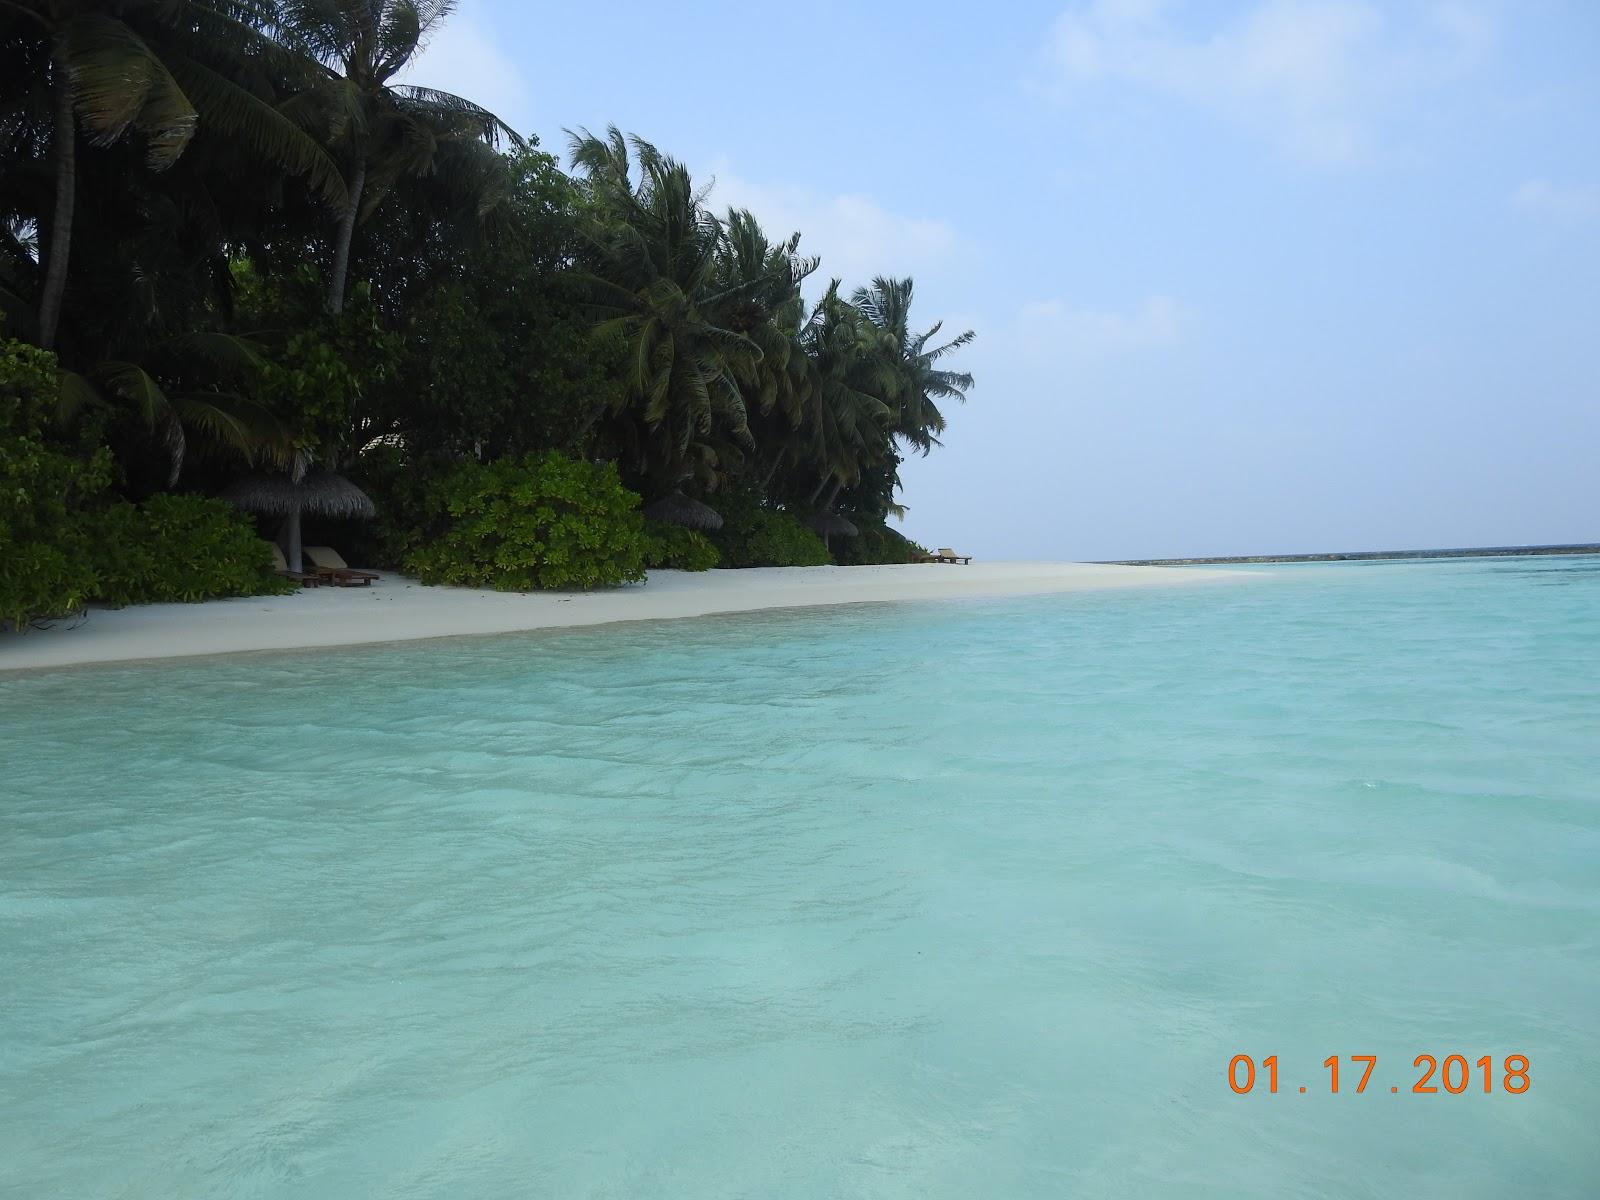 invite-to-paradise-sri-lanka-maldives-holiday-specialists-nutan-vidyut-patel-baros-beach.jpg